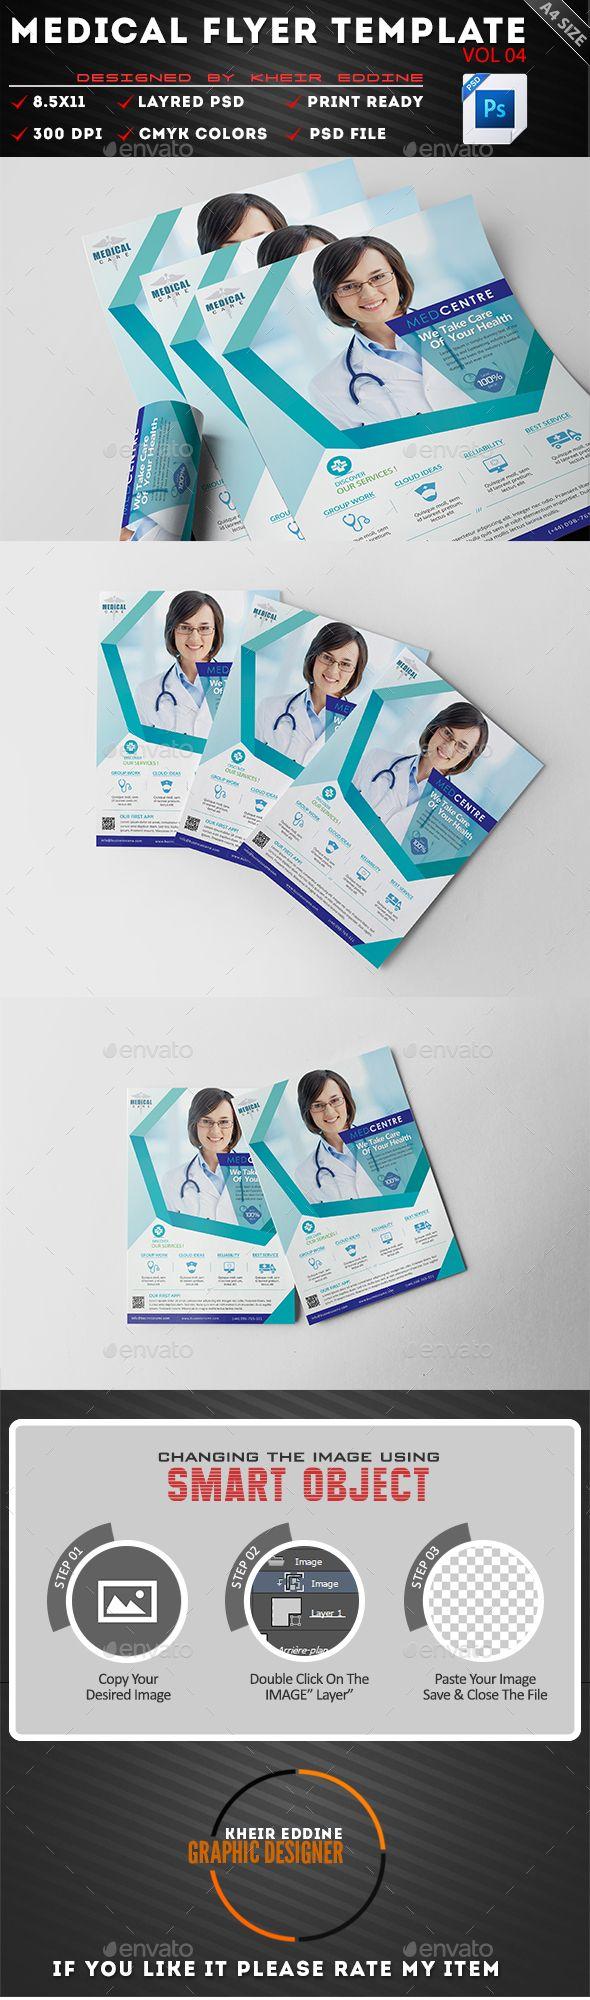 Medical Flyer Template Vol 04 30 best